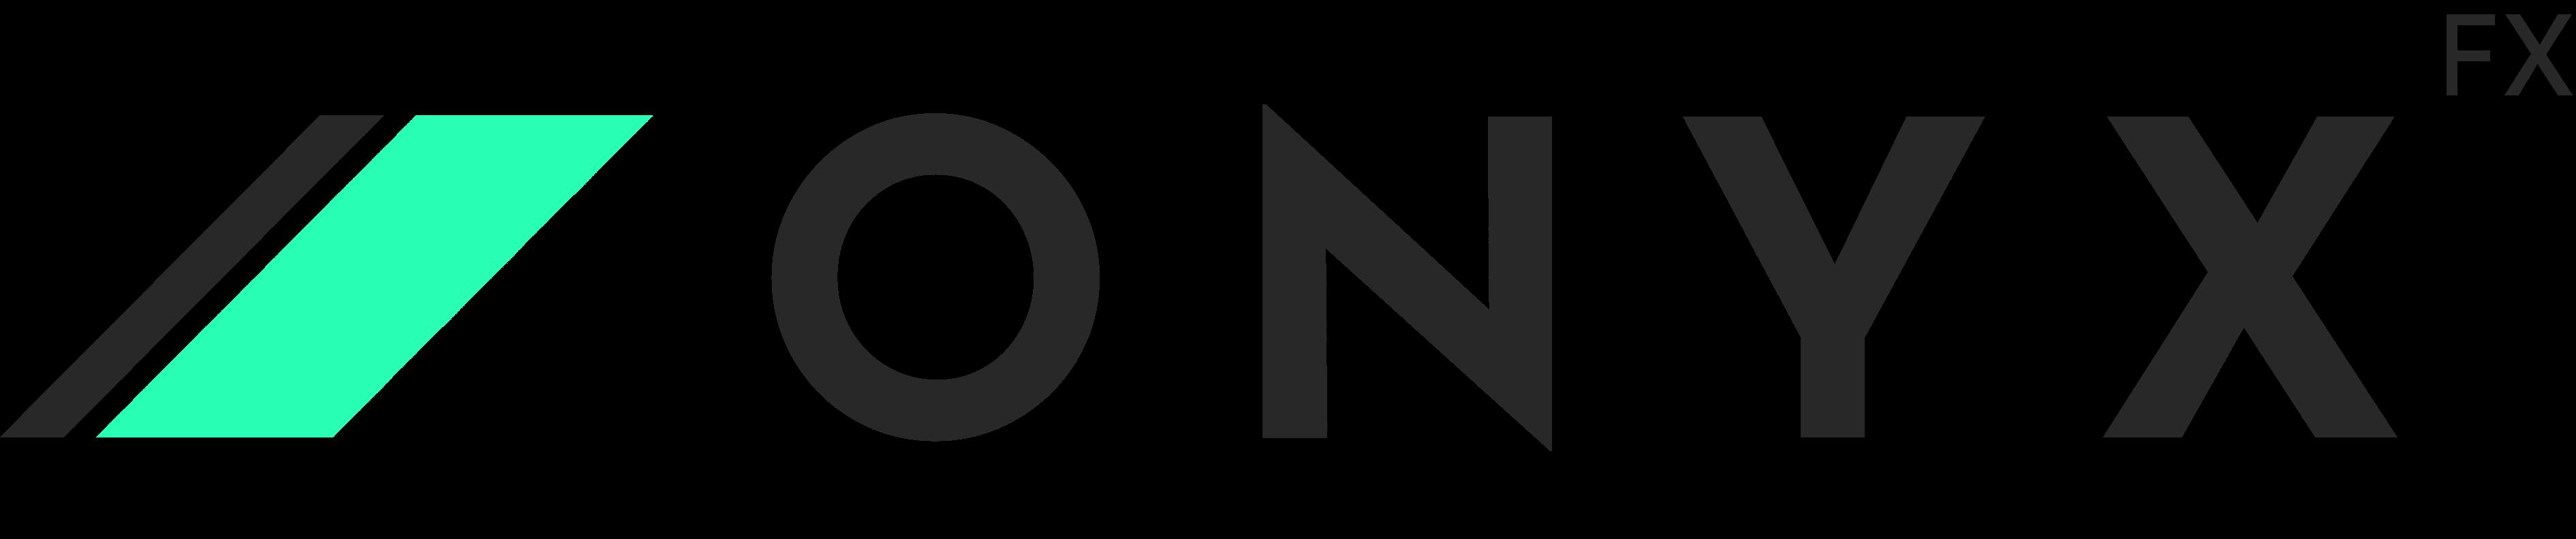 Is Onyx Fx Global a Scam Logo